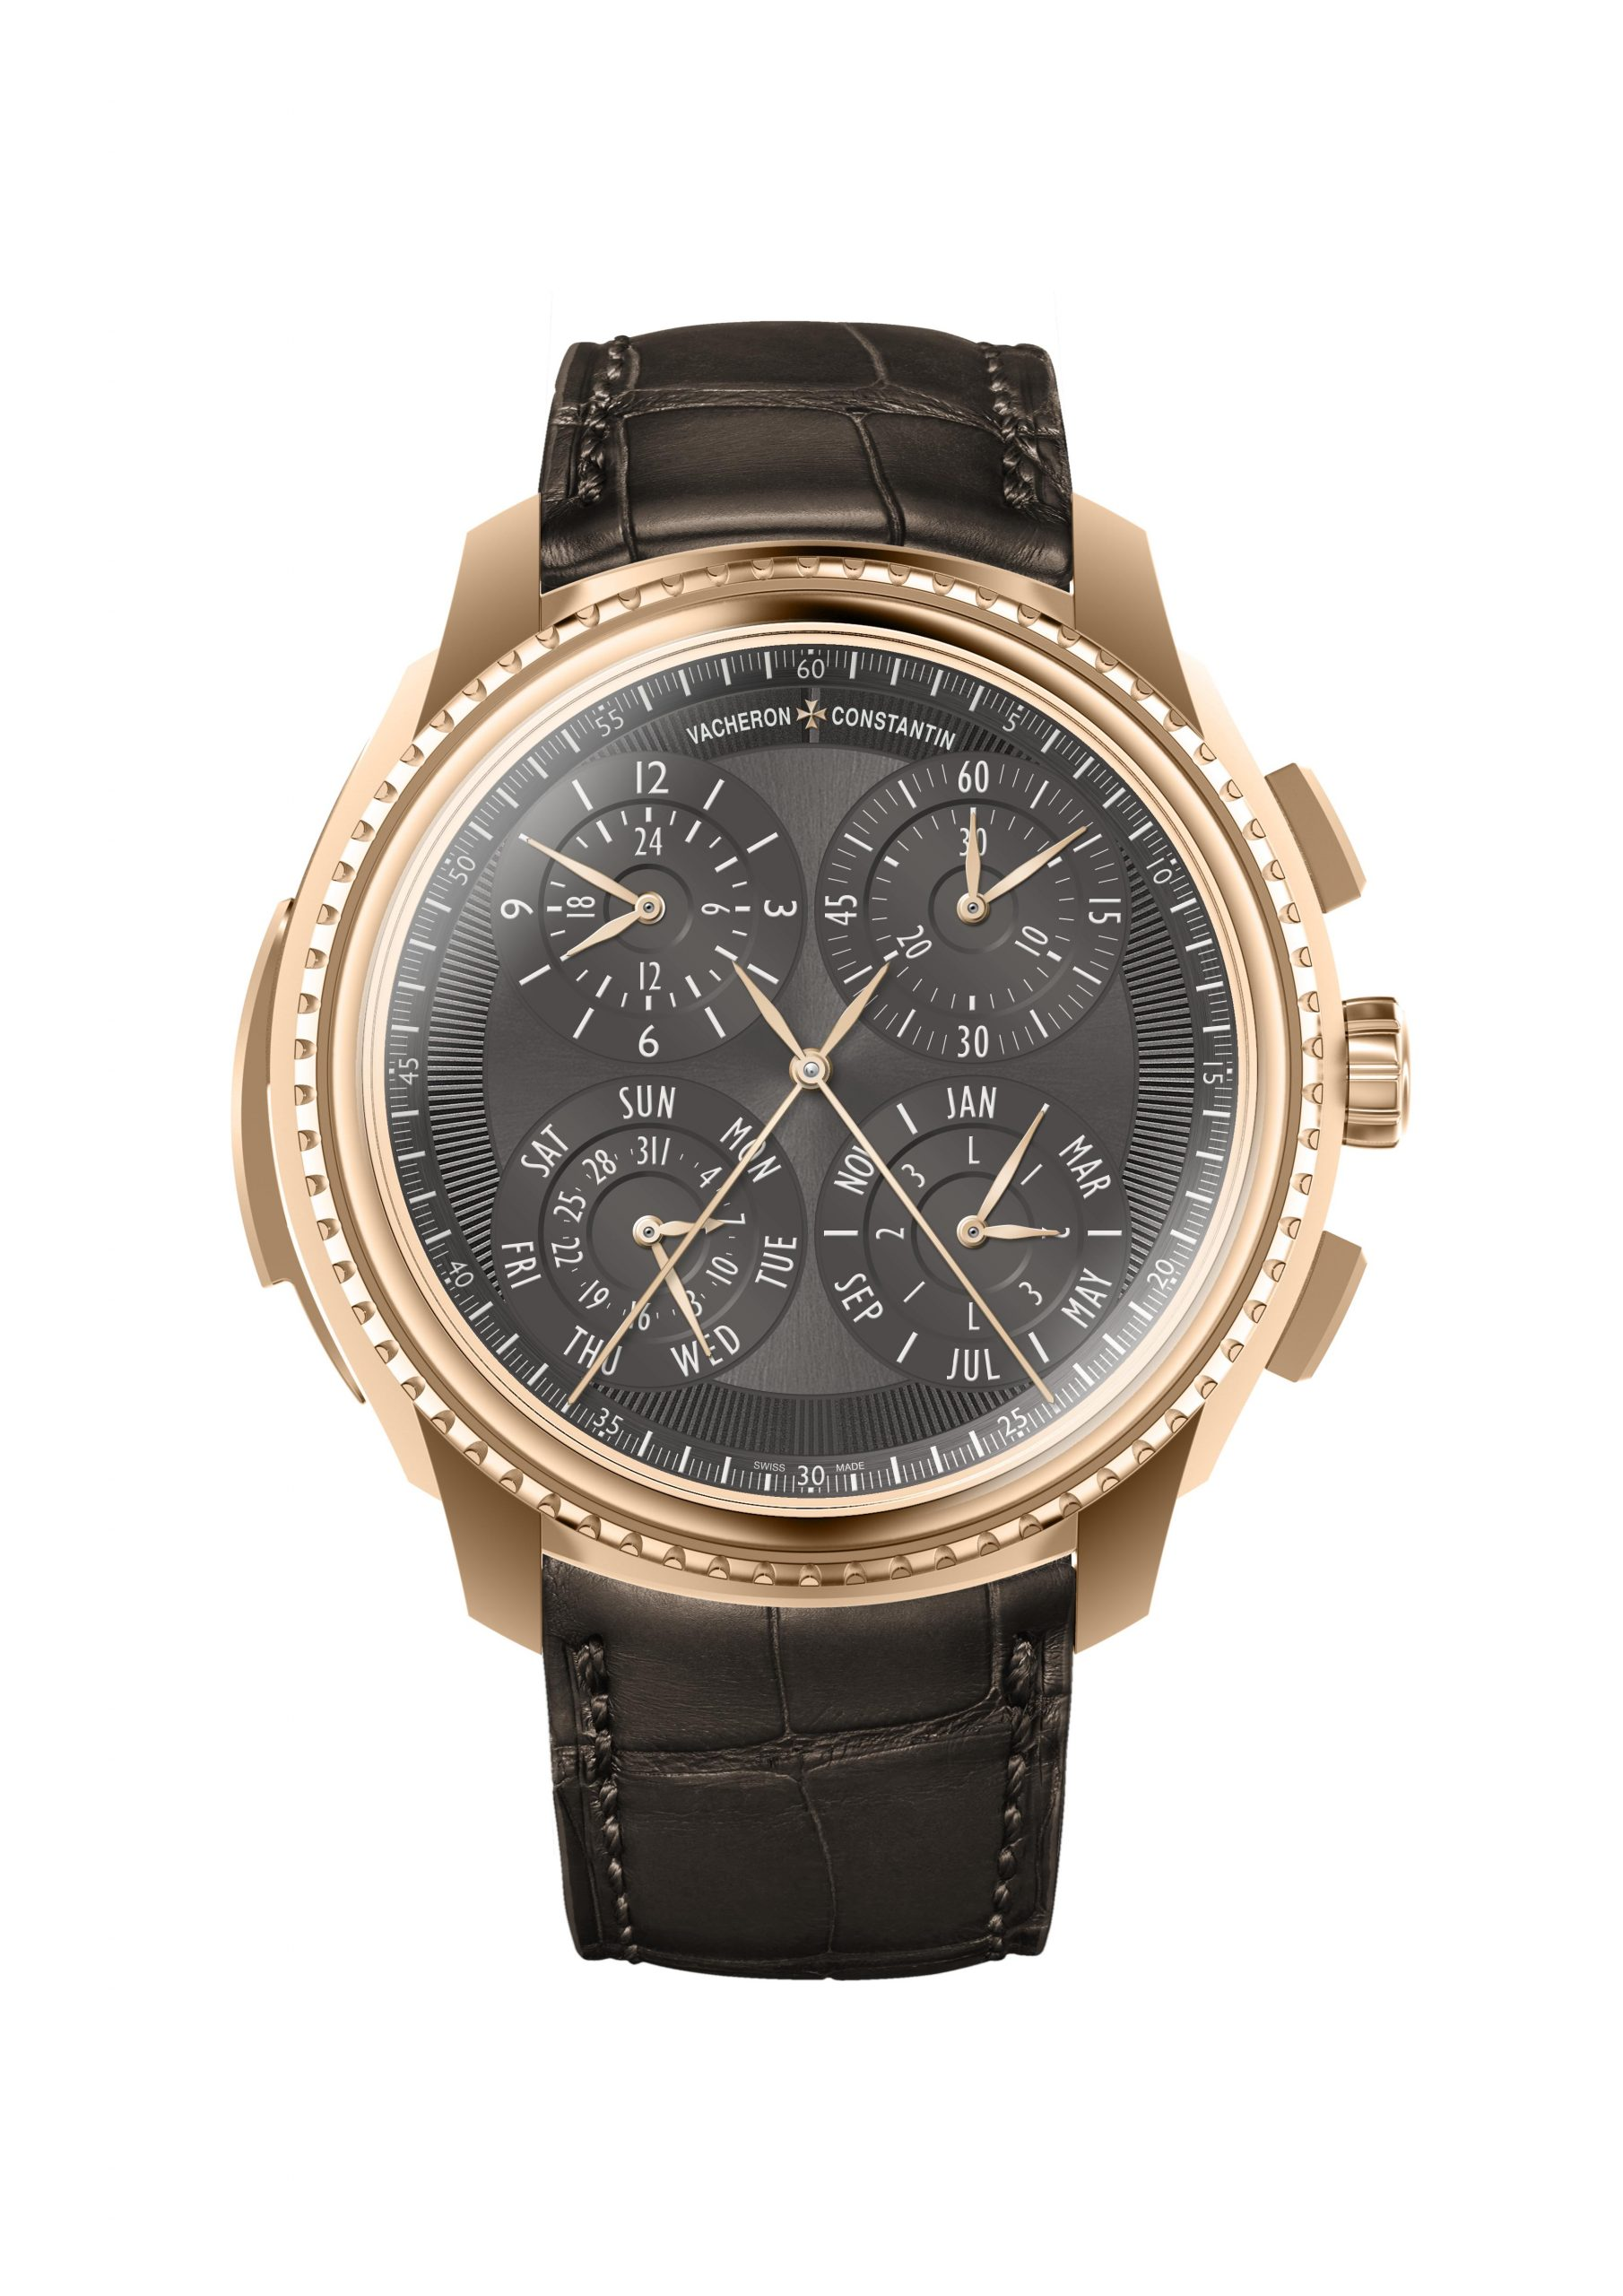 Les Cabinotiers Grande Complication chronographe à rattrapante – Tempo